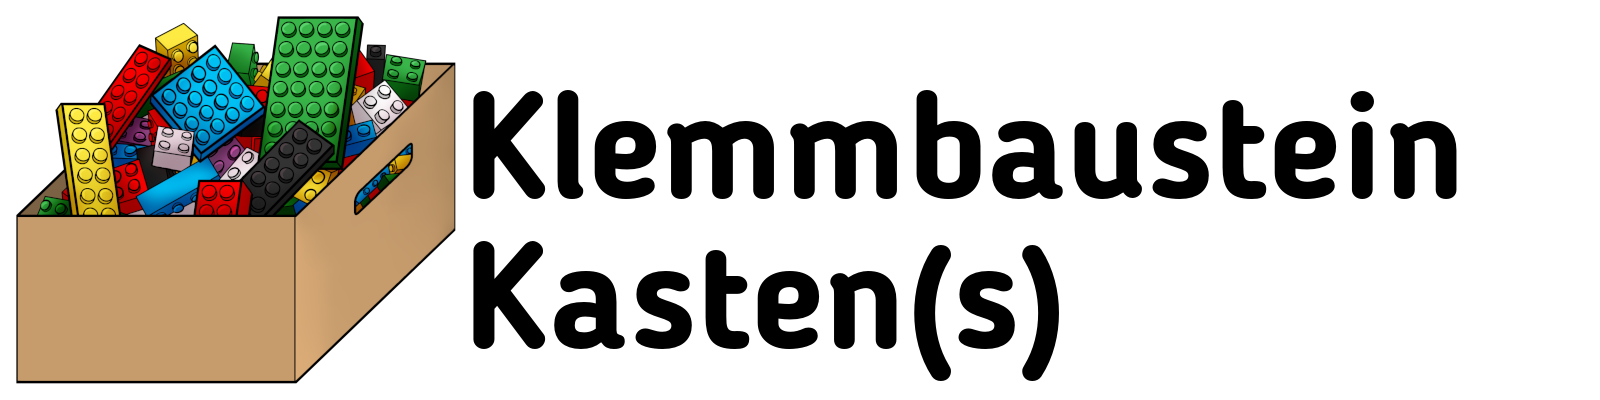 Klemmbaustein Kasten(s)-Logo